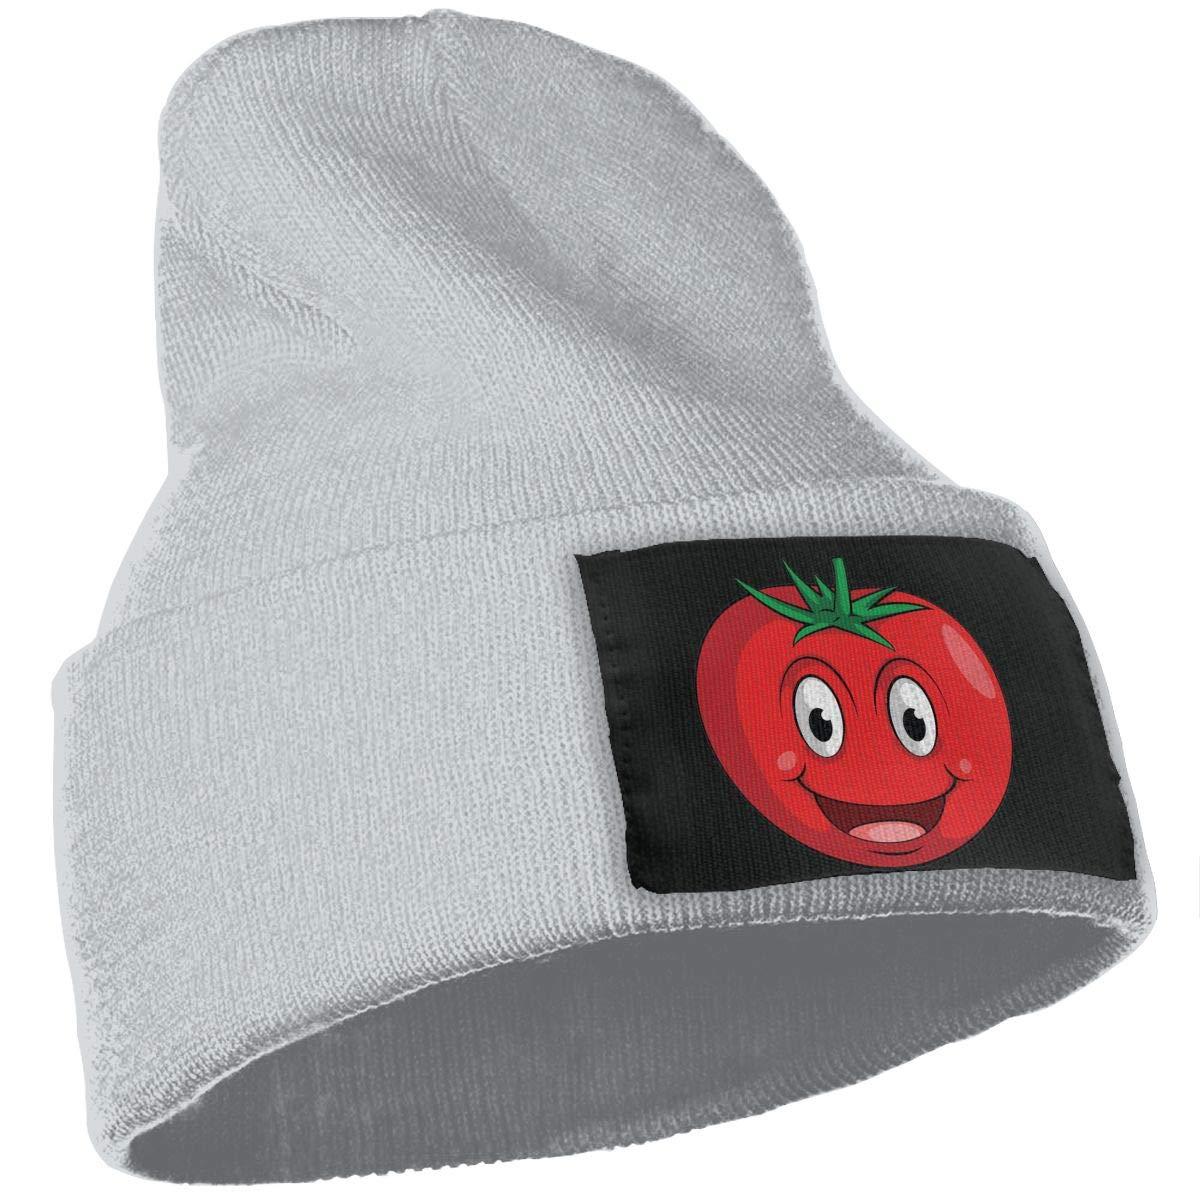 Smile Tomato Warm Winter Hat Knit Beanie Skull Cap Cuff Beanie Hat Winter Hats for Men /& Women